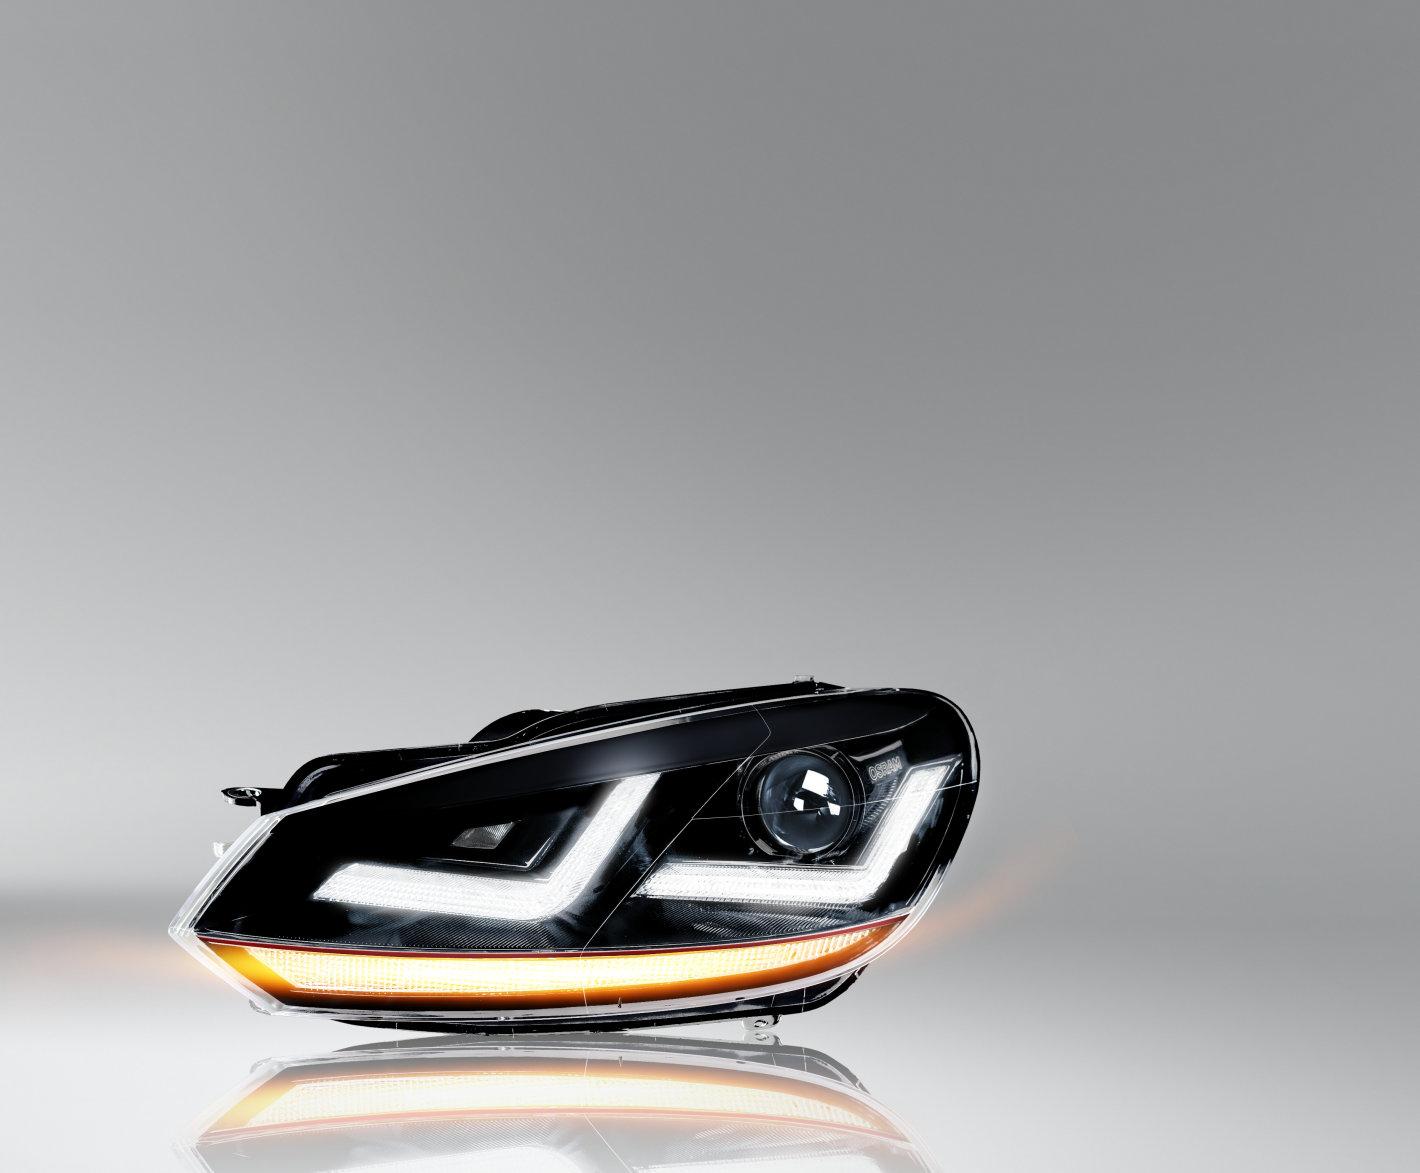 LEDriving XENARC Golf VI GTI Edition